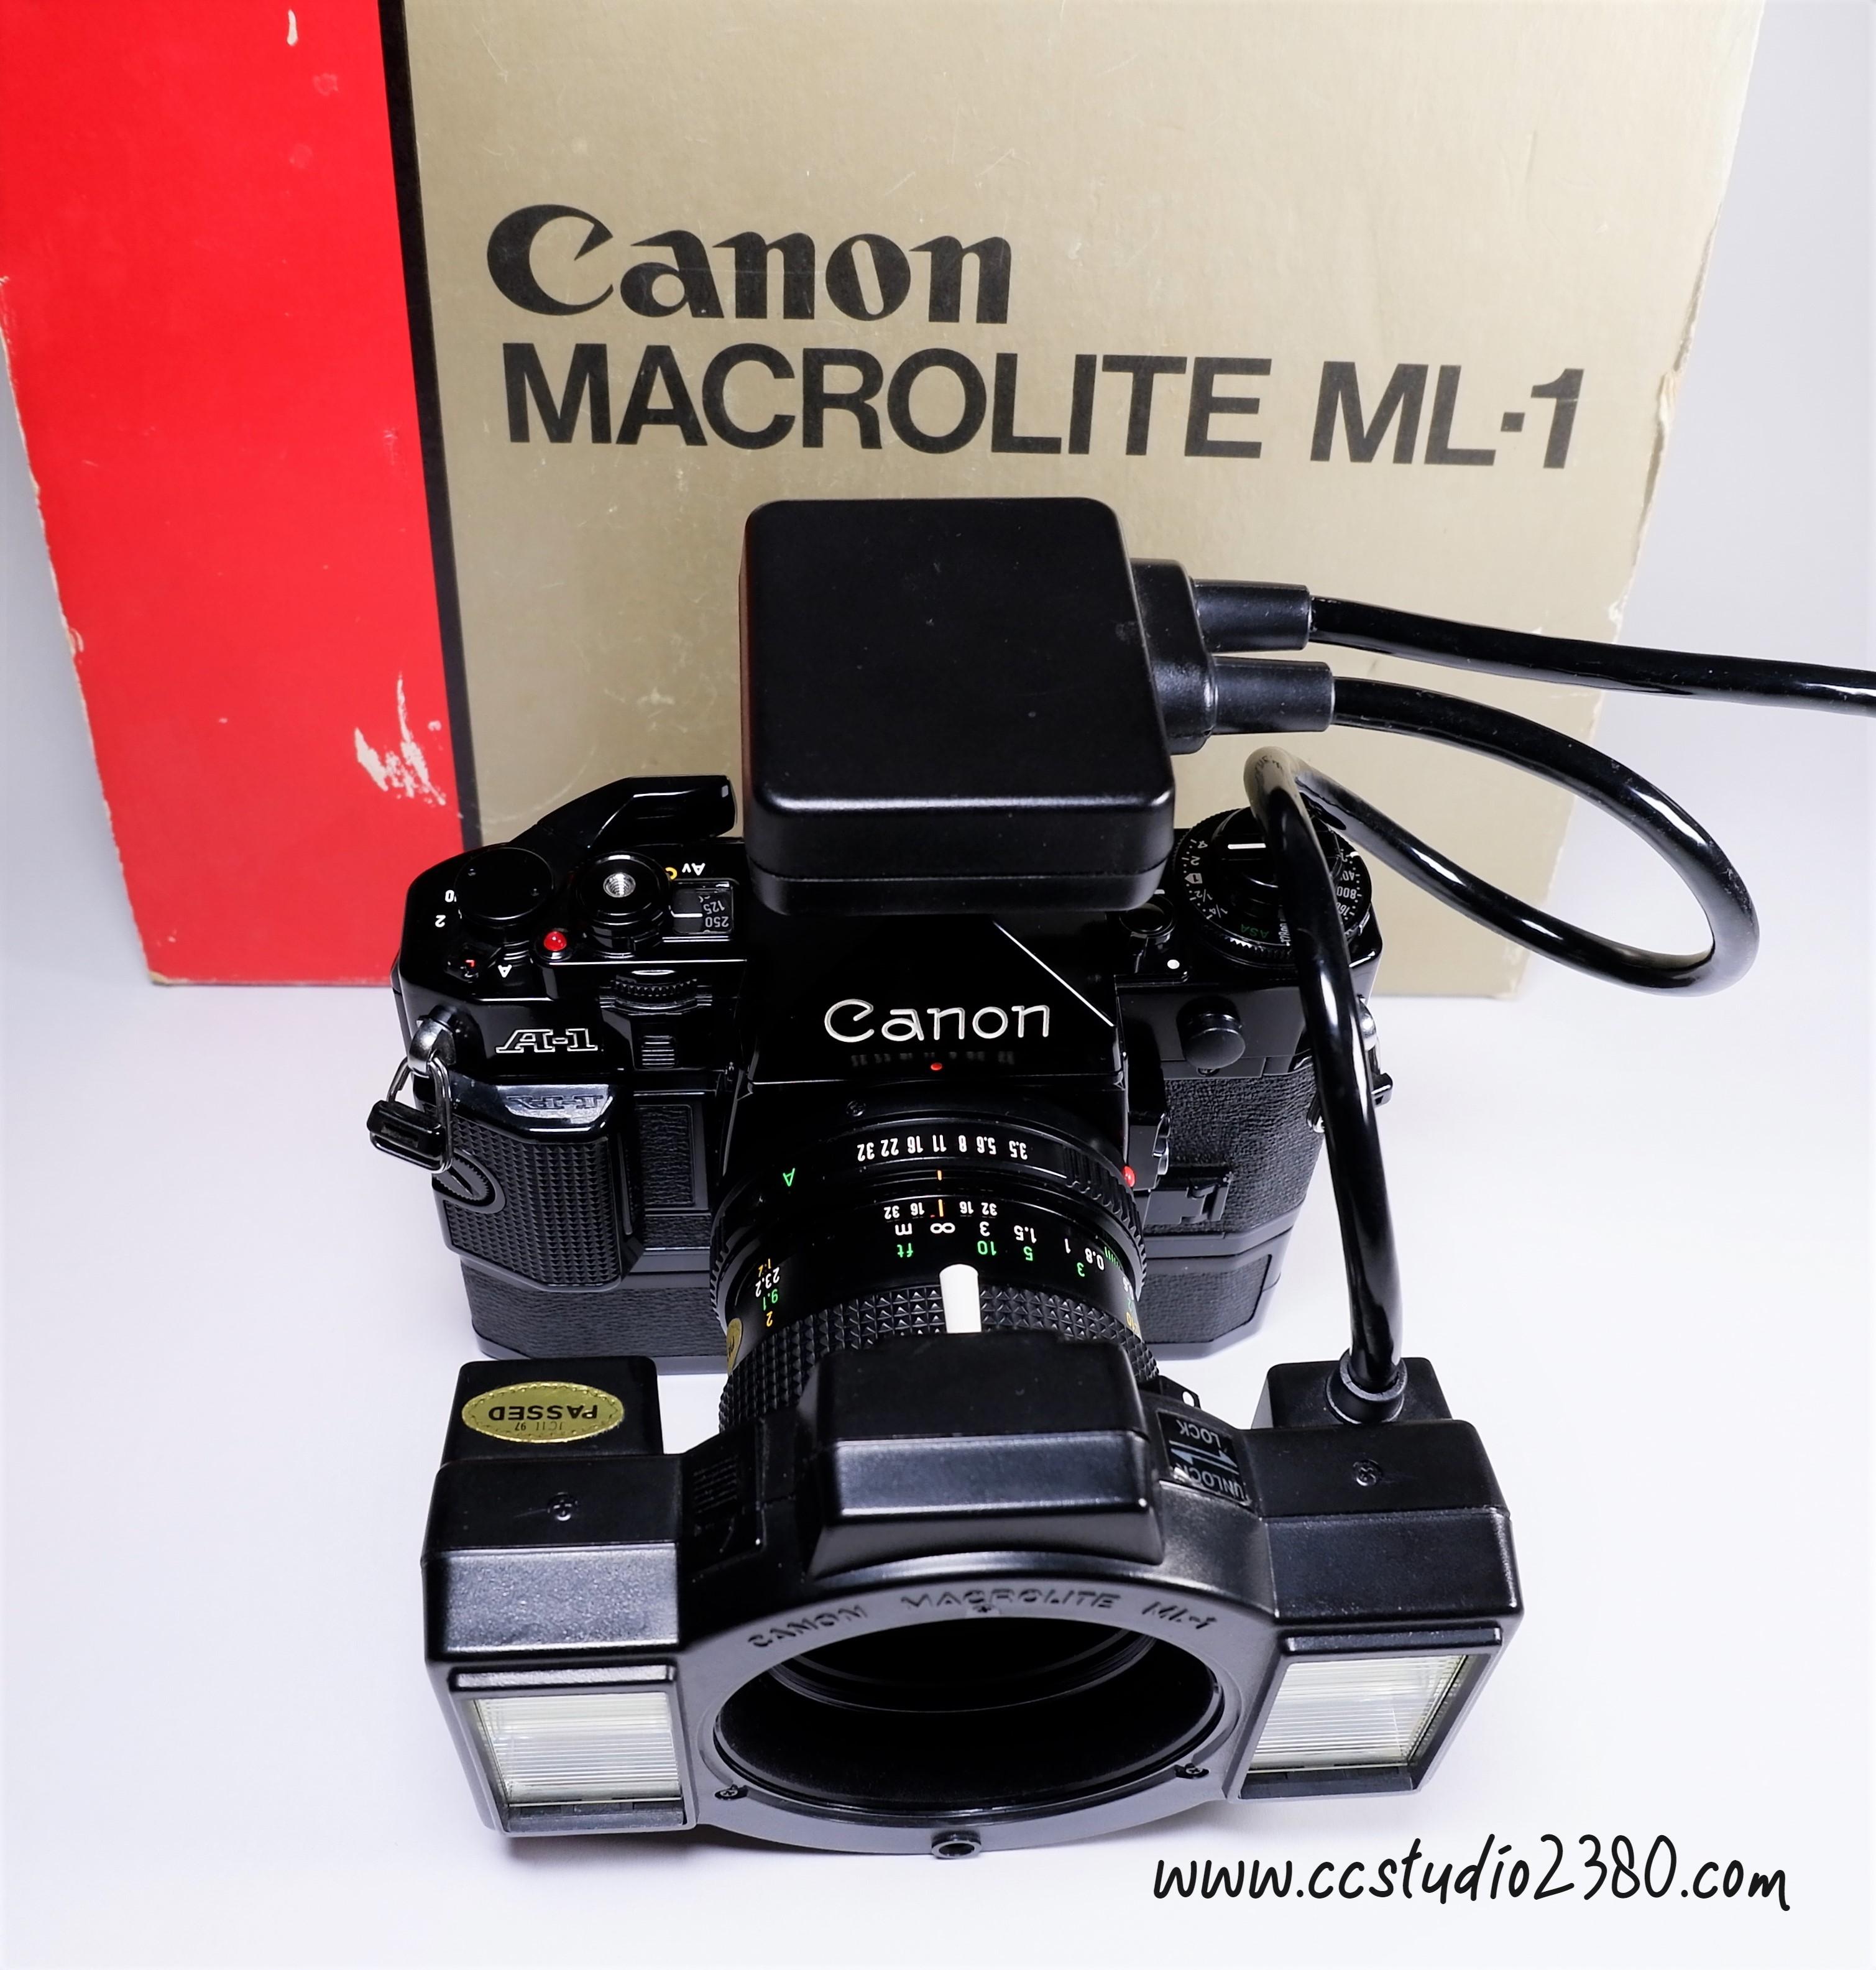 Canon macrolite